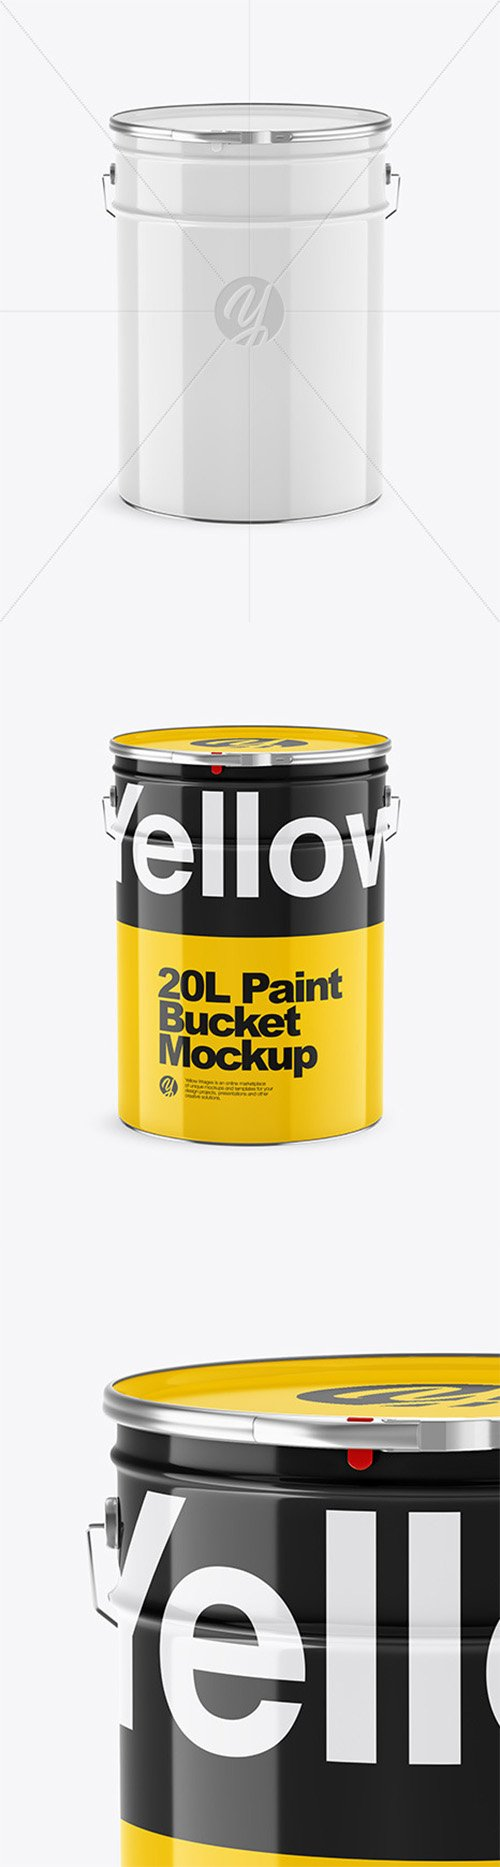 20L Glossy Paint Bucket Mockup 65166